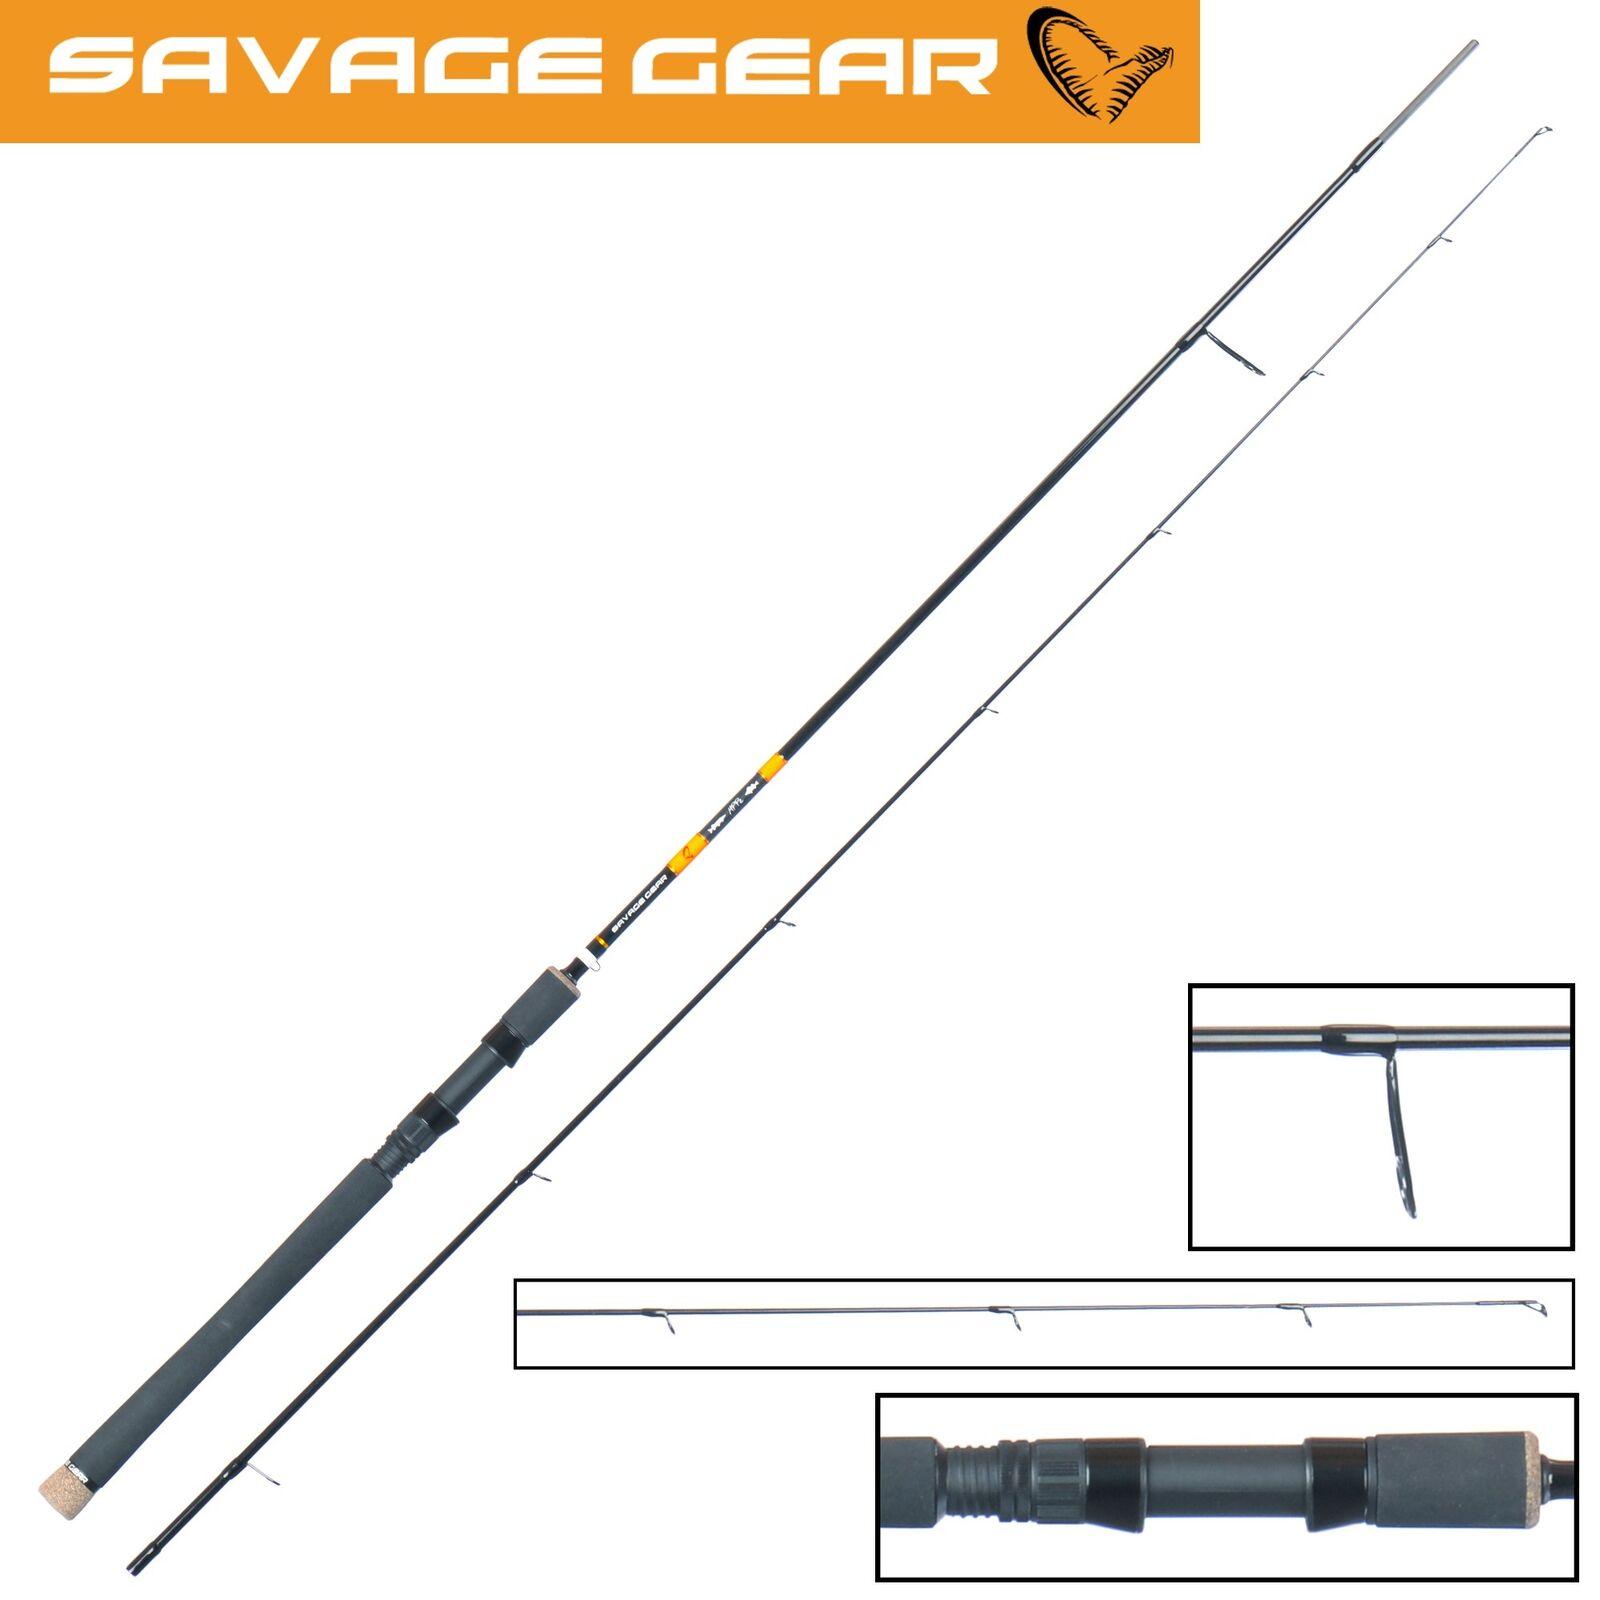 Savage Savage Savage Gear MPP2 Spinnrute 251cm 7-25g - Barschrute, Spinnangelrute 570920